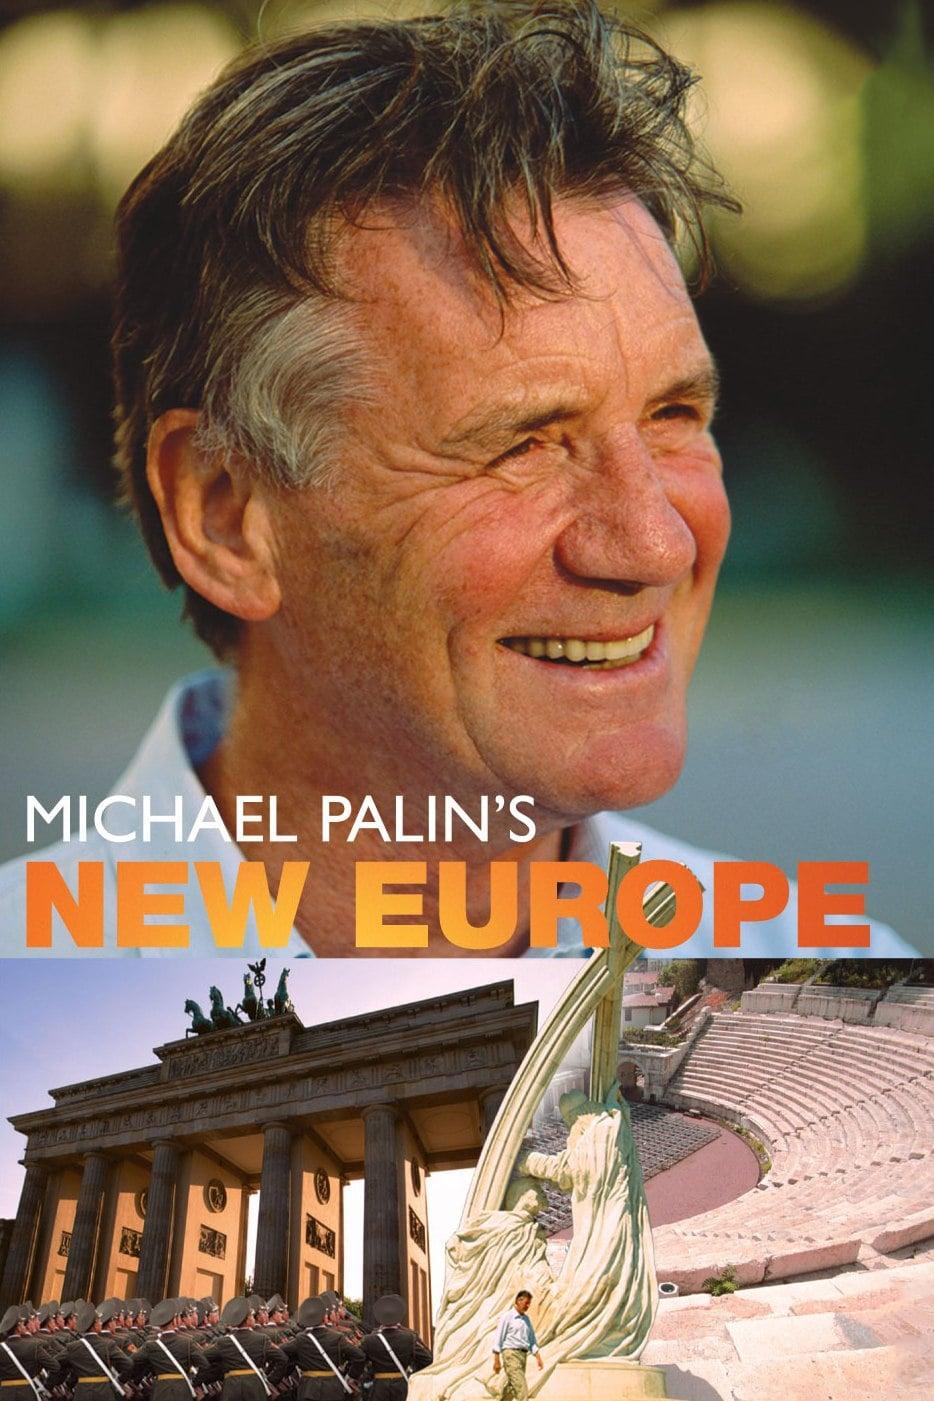 Michael Palin's New Europe (2007)